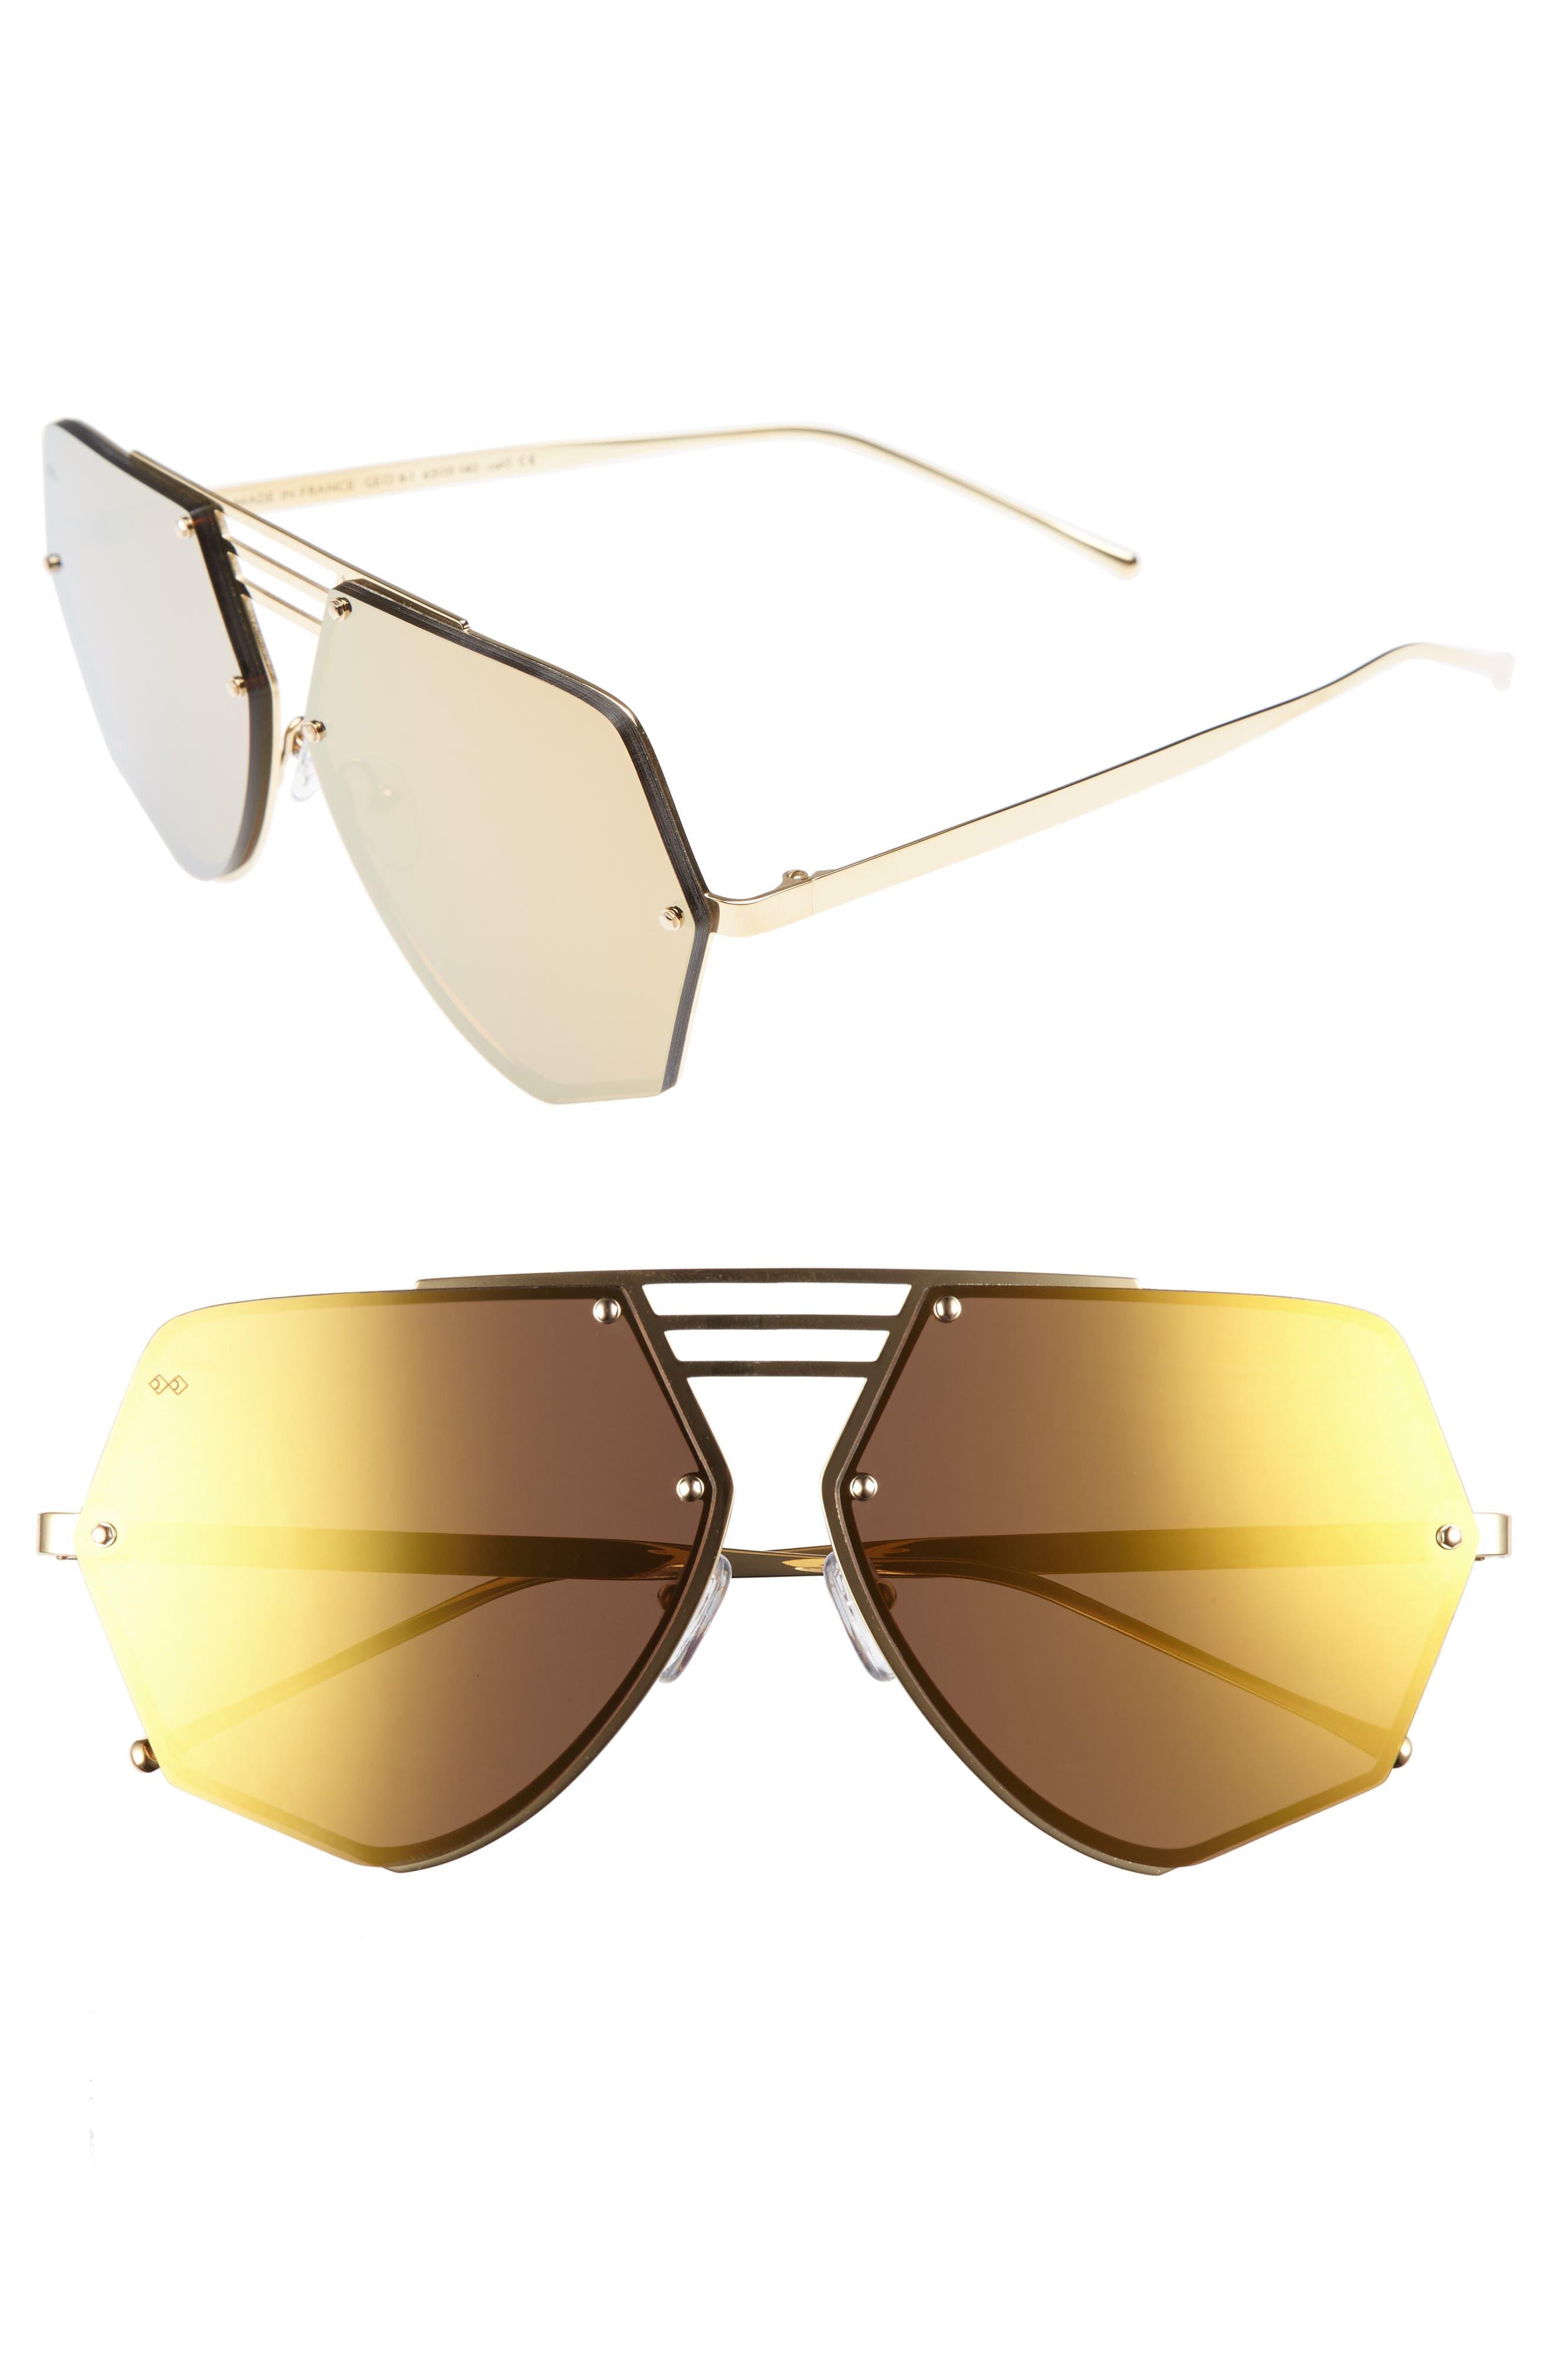 Geo 8 63mm Mirrored Sunglasses,                             Main thumbnail 1, color,                             712